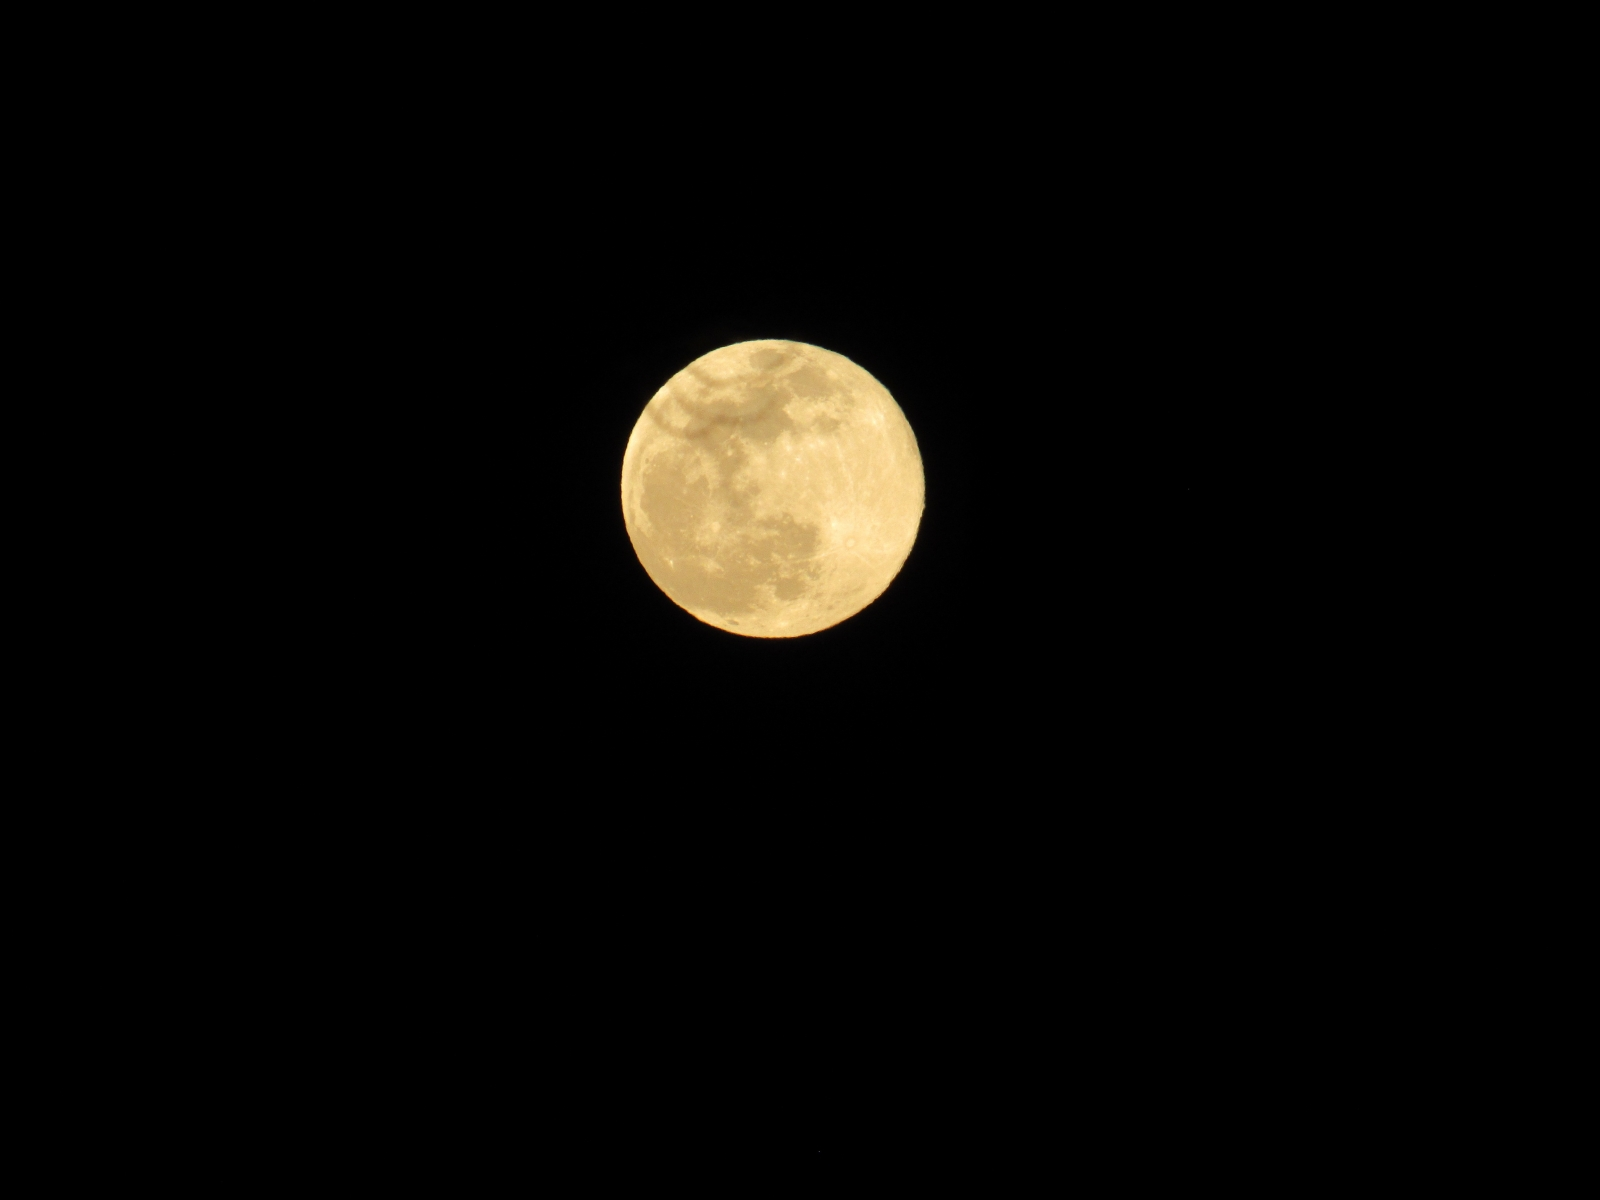 Moon-in-a-dark-sky